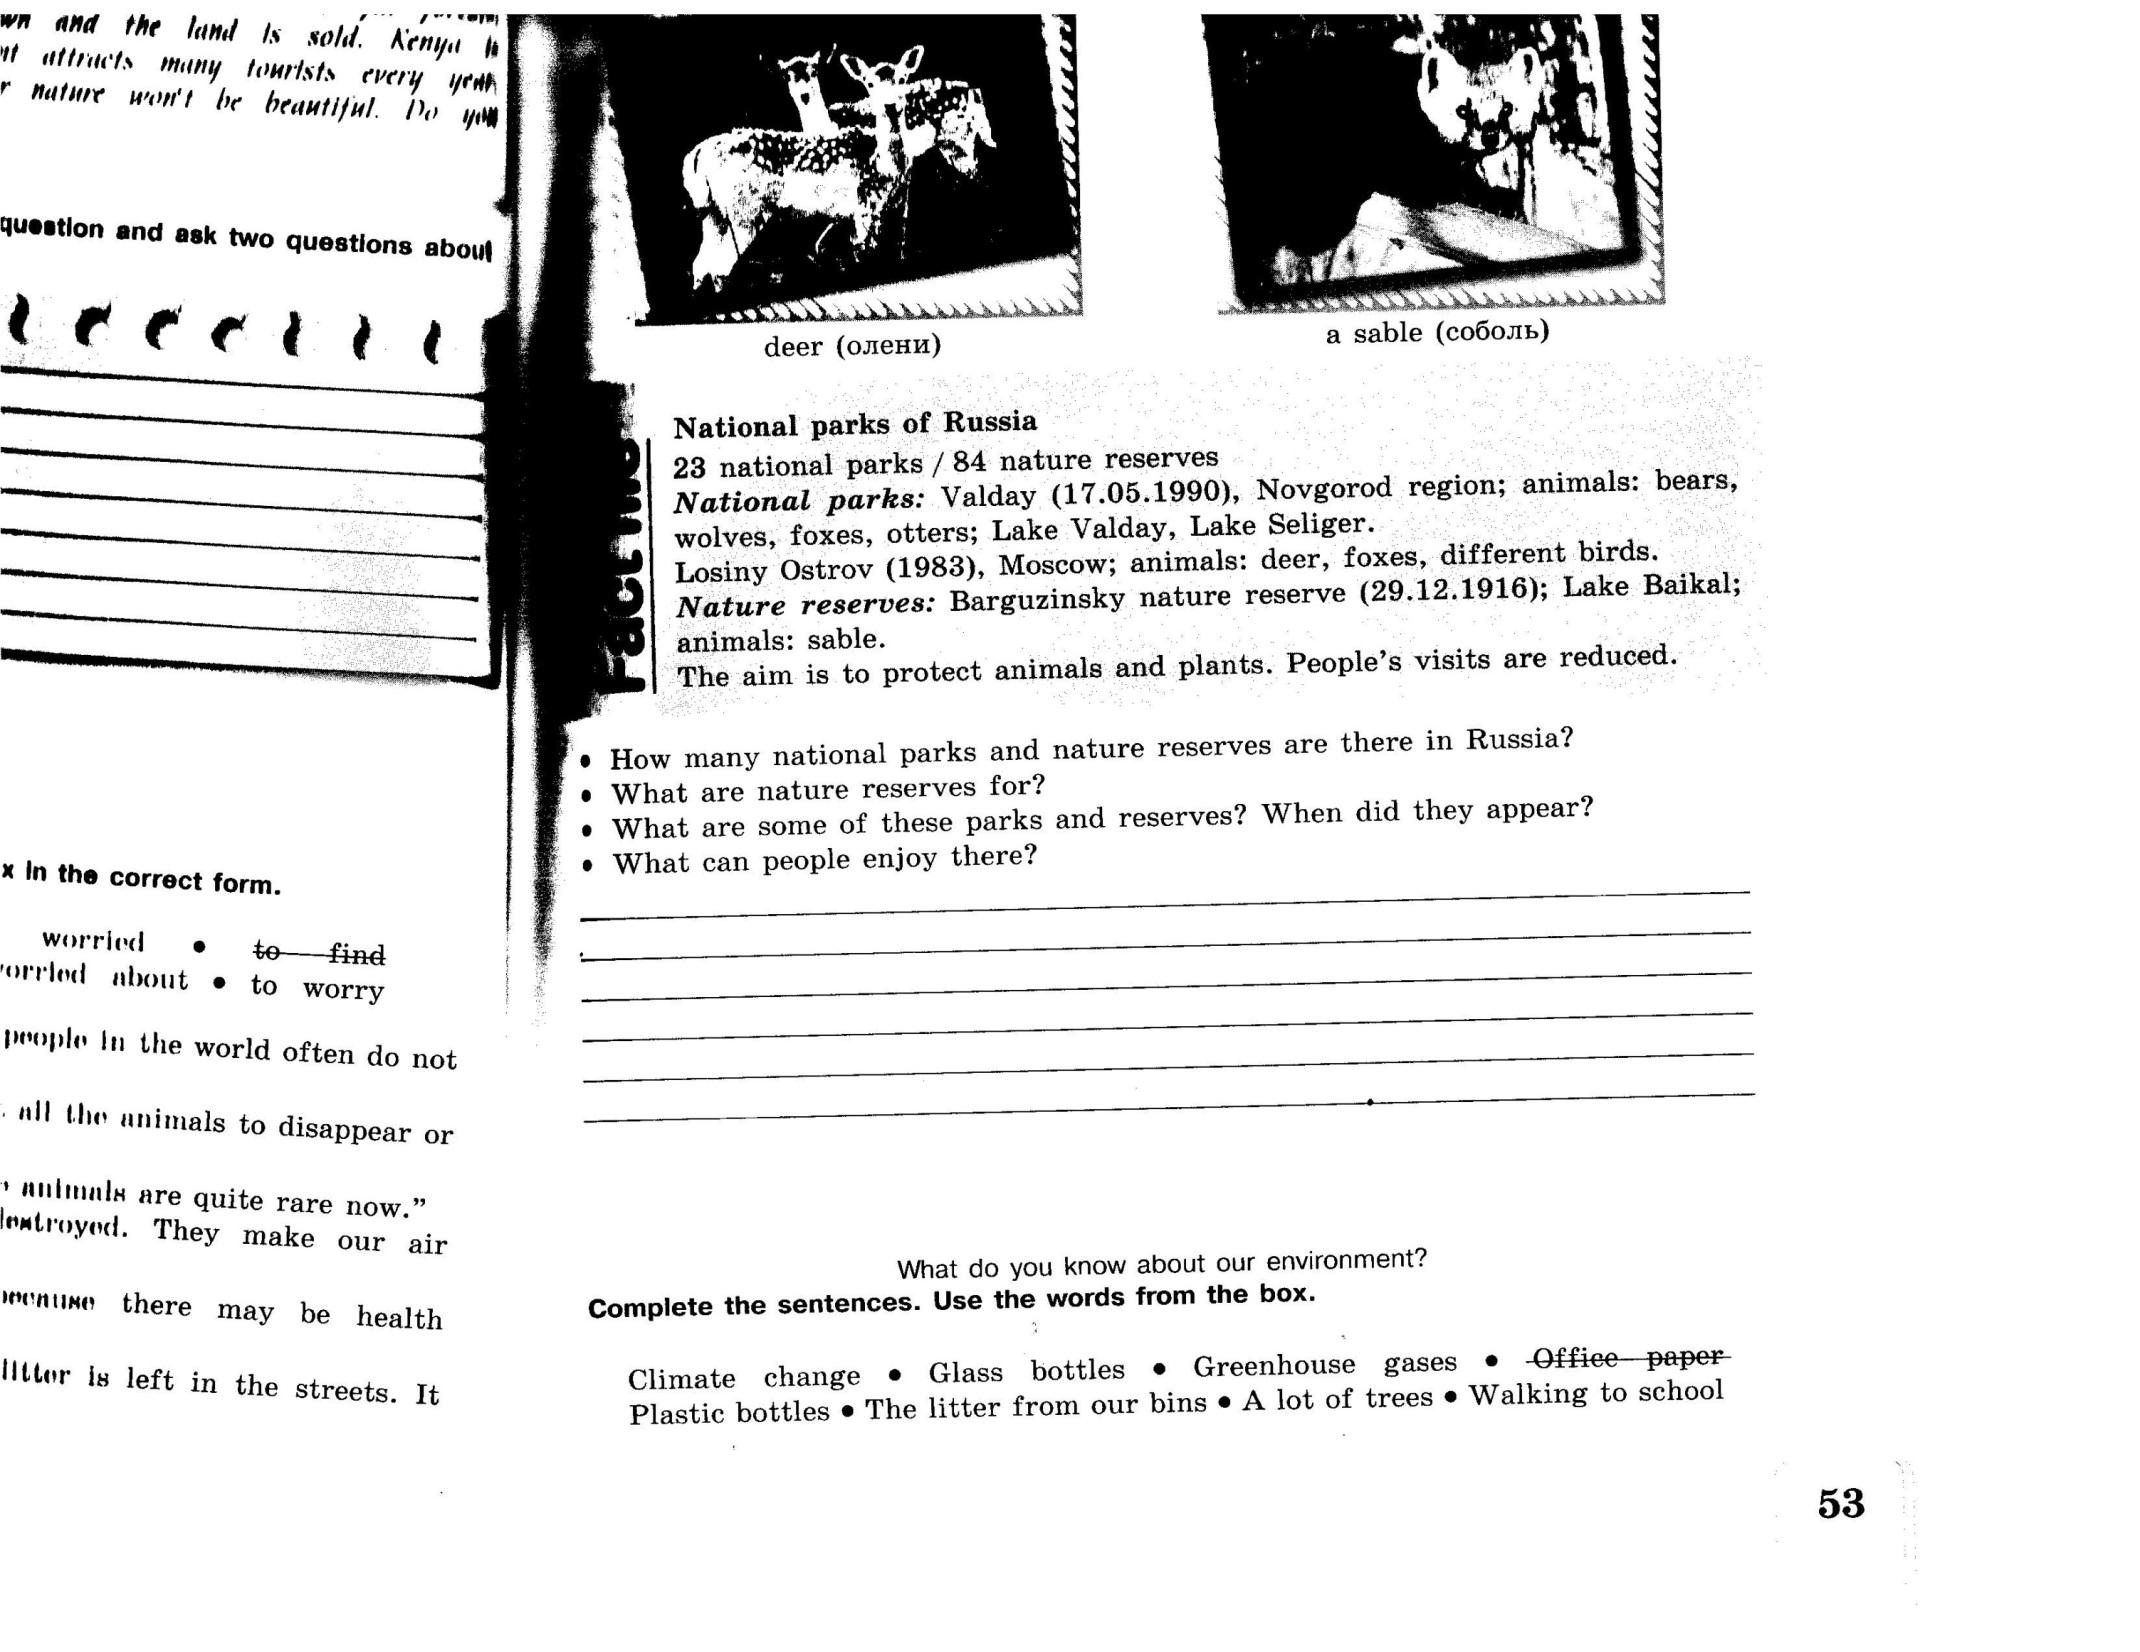 C:\Users\Грузиновская СОШ\Documents\Scanned Documents\Рисунок (1557).jpg